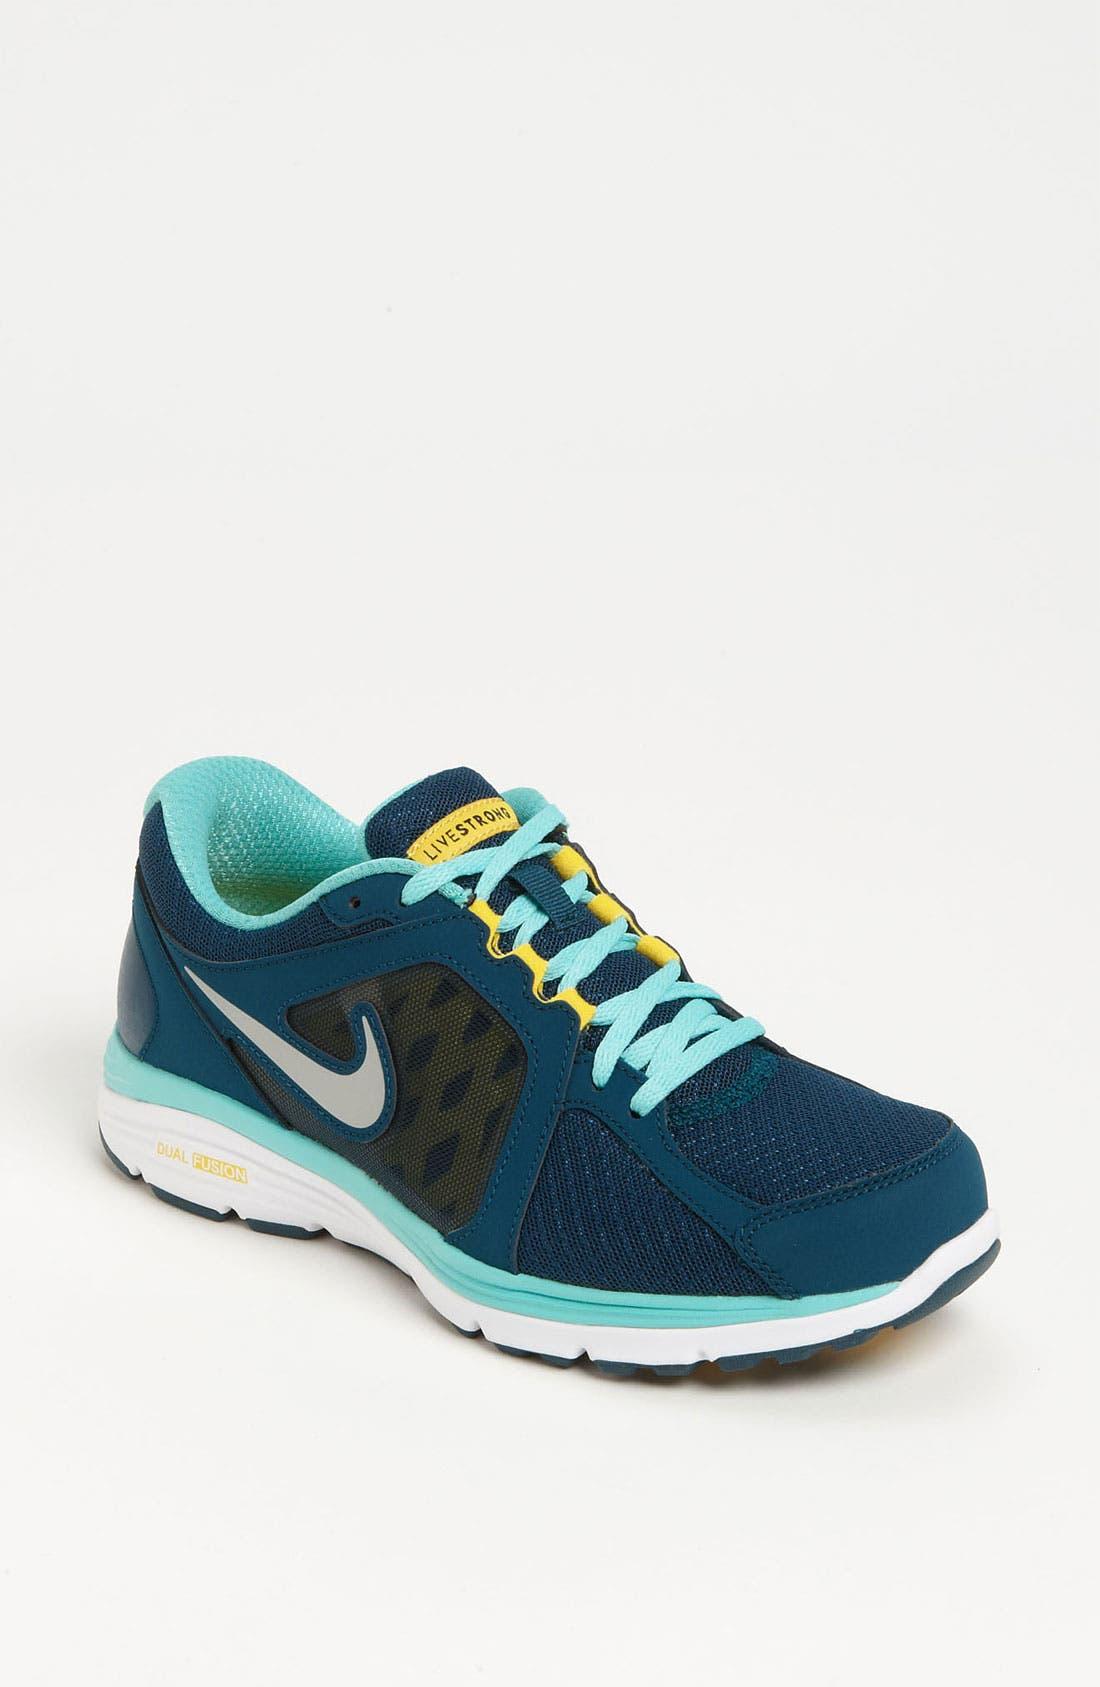 Alternate Image 1 Selected - Nike 'Dual Fusion Run Livestrong' Running Shoe (Women)